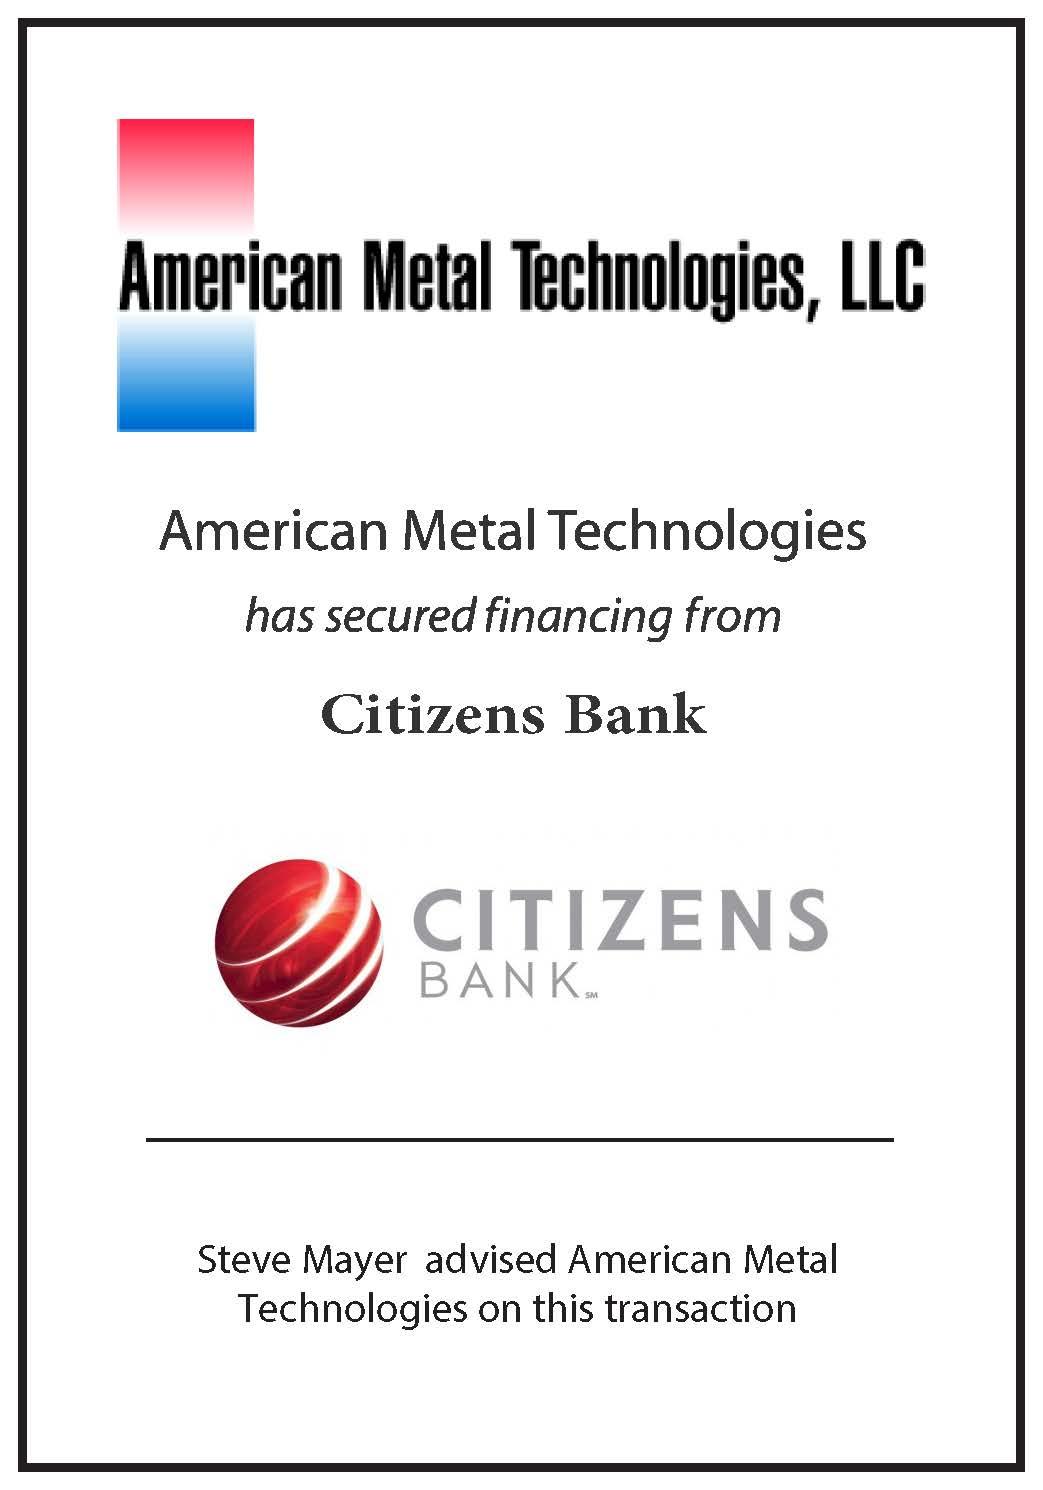 American Metal Technologies